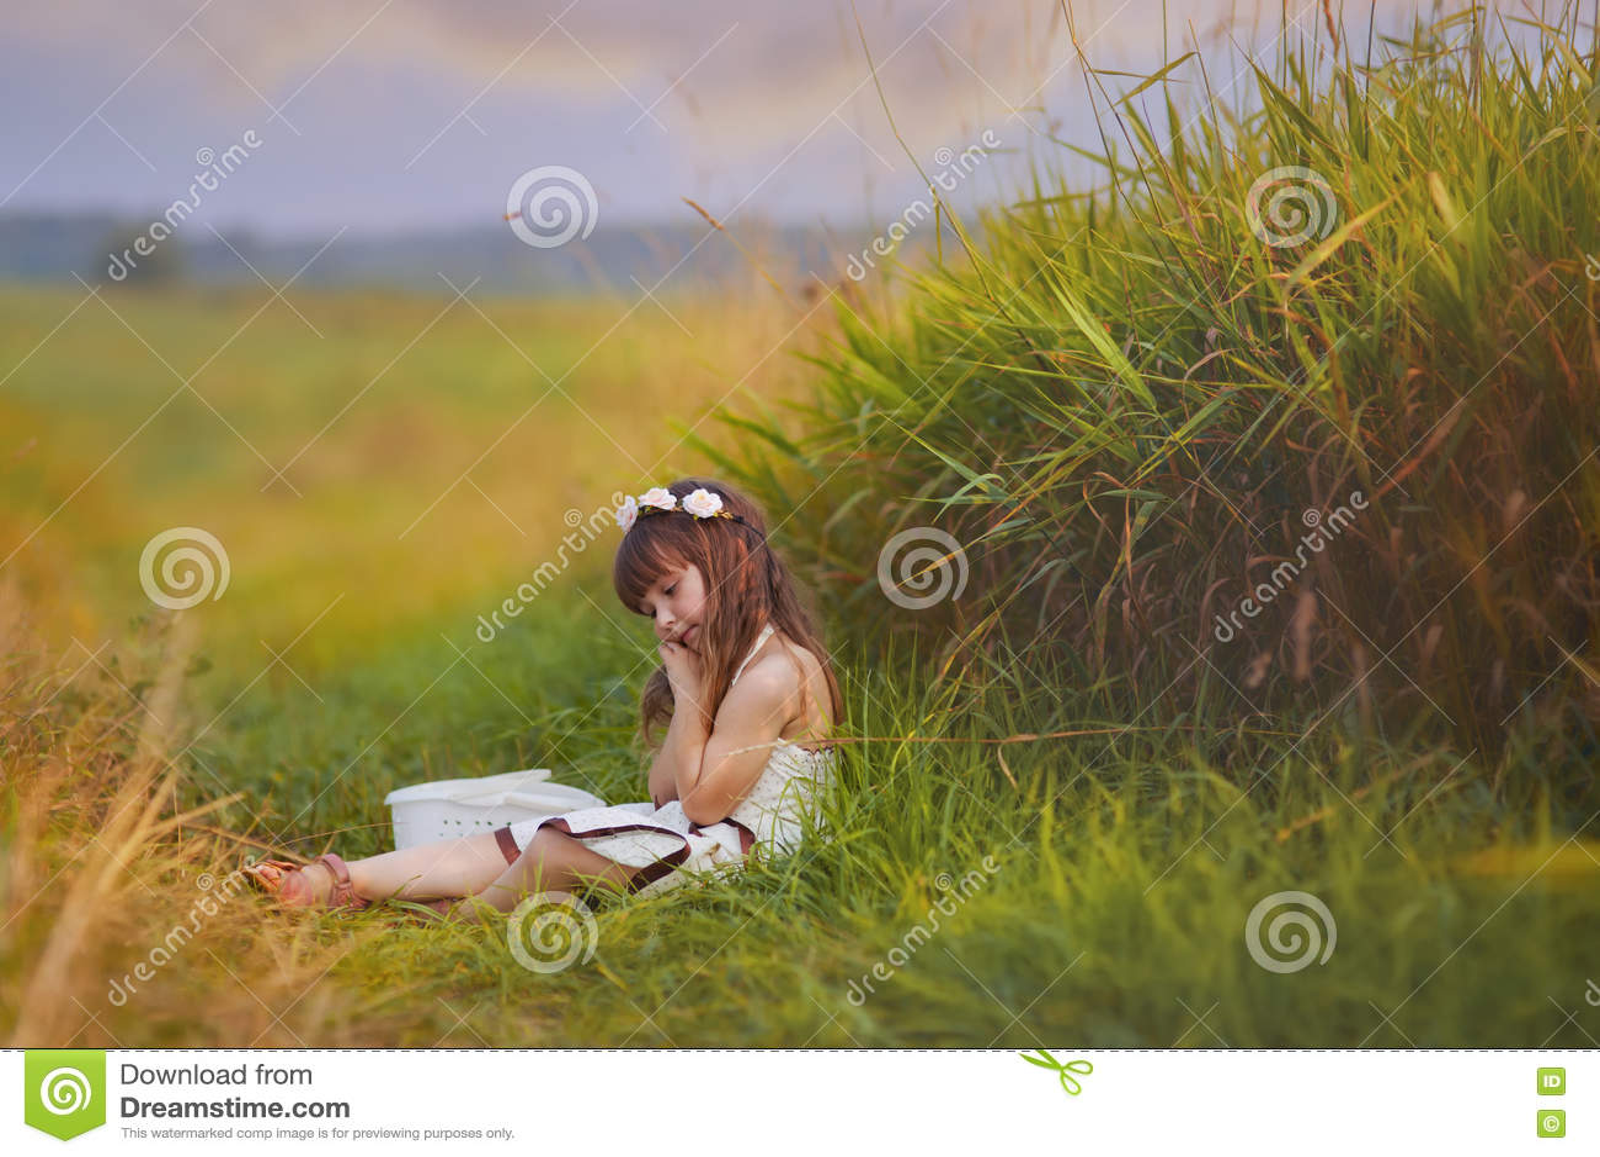 Girl relaxing in grass